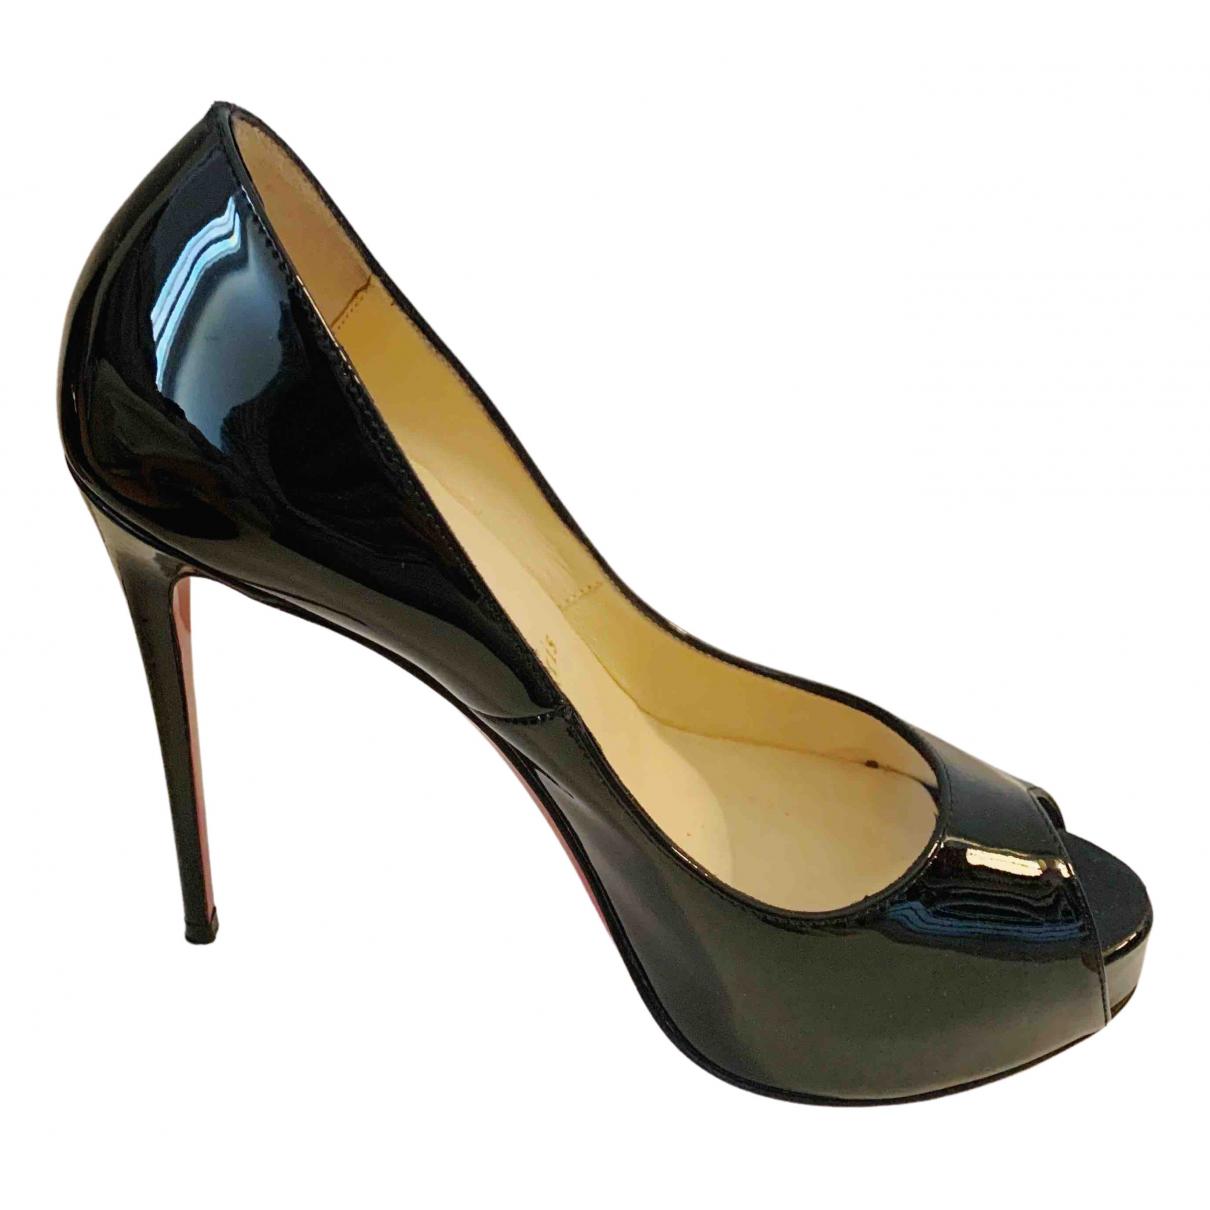 Christian Louboutin Very Privé Black Patent leather Heels for Women 35 EU